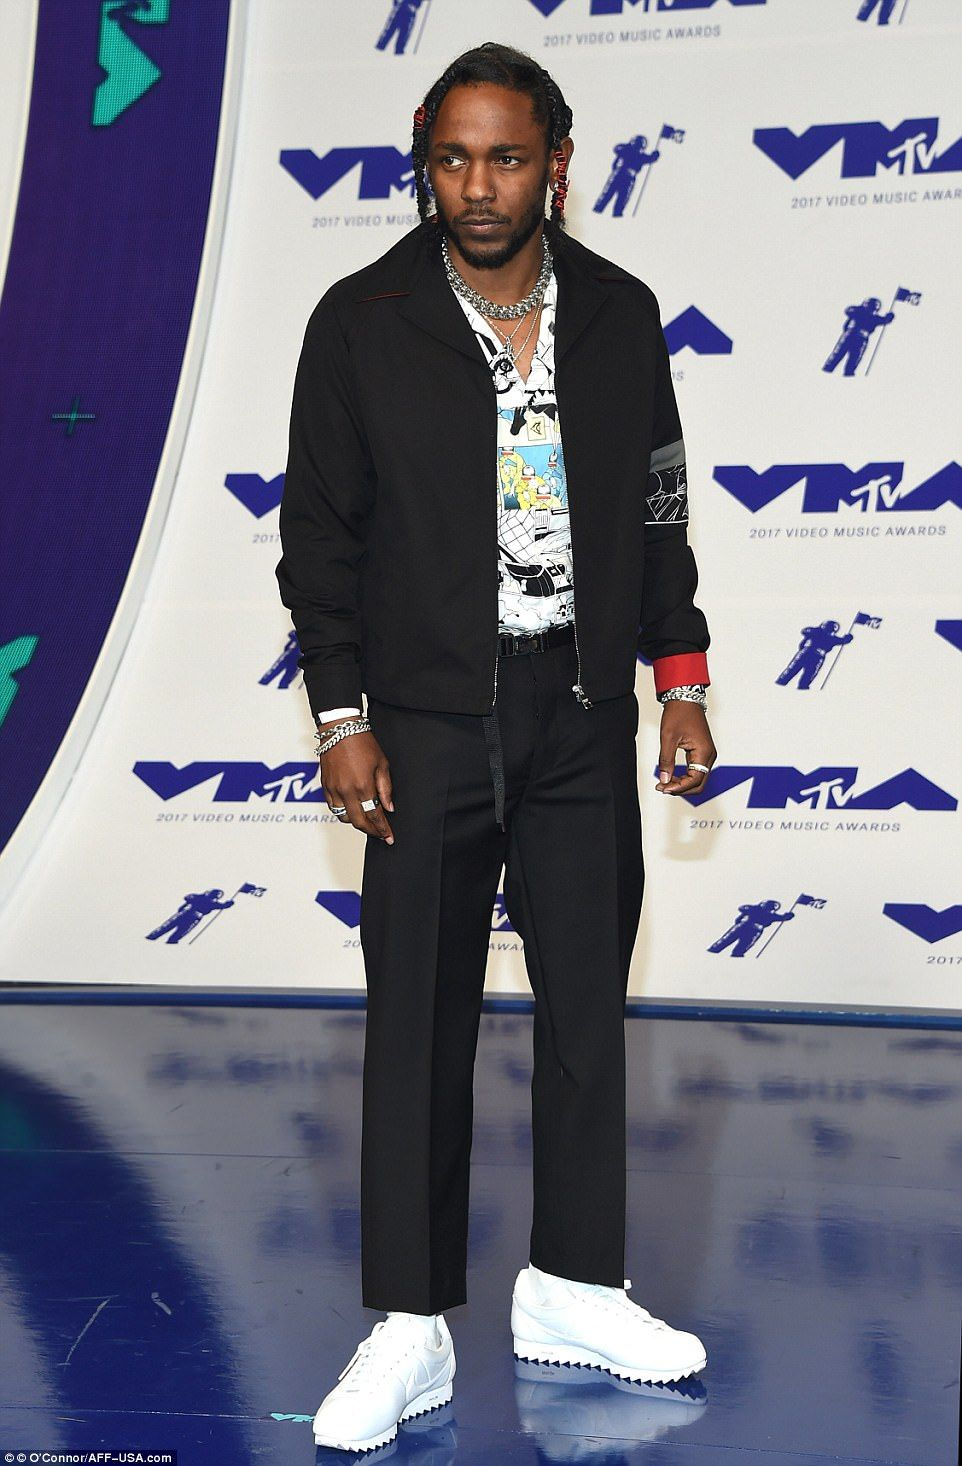 online store 1719d cf4a6 MTV Video Music Awards arrivals | streetwear | Nike cortez ...